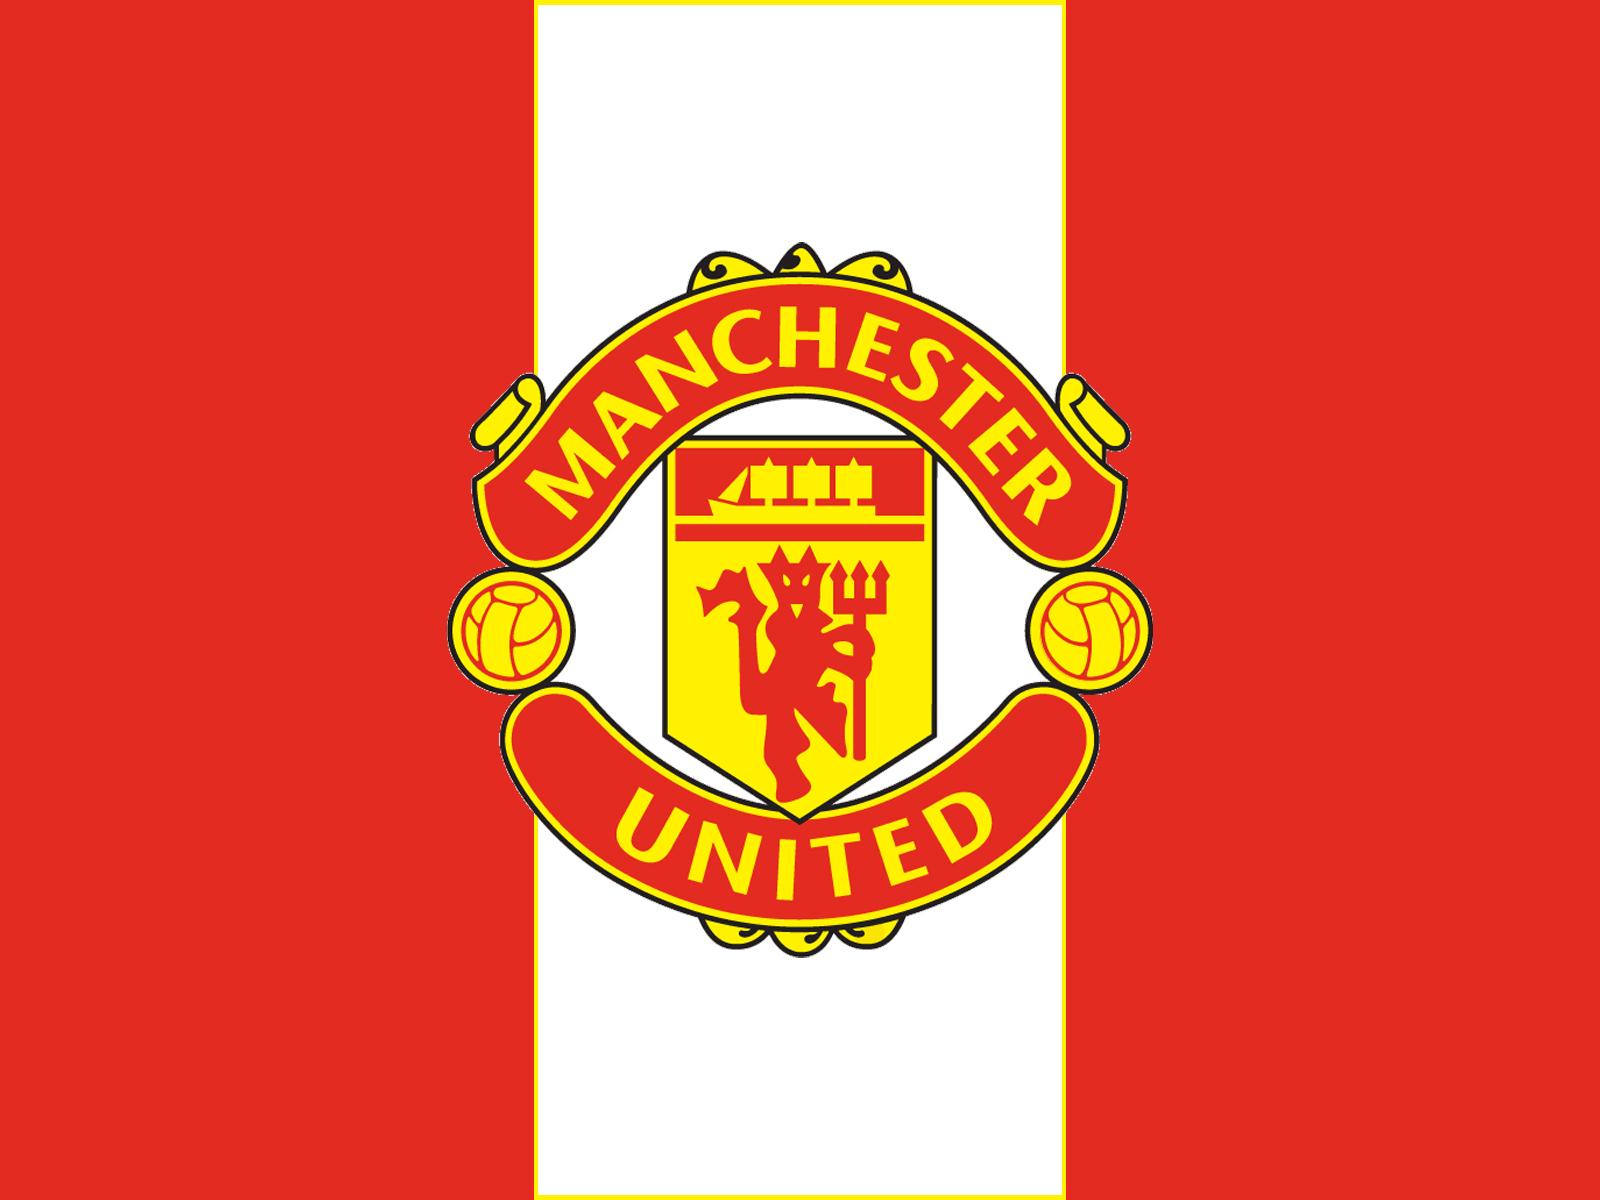 76 Manchester United Logo Wallpaper On Wallpapersafari